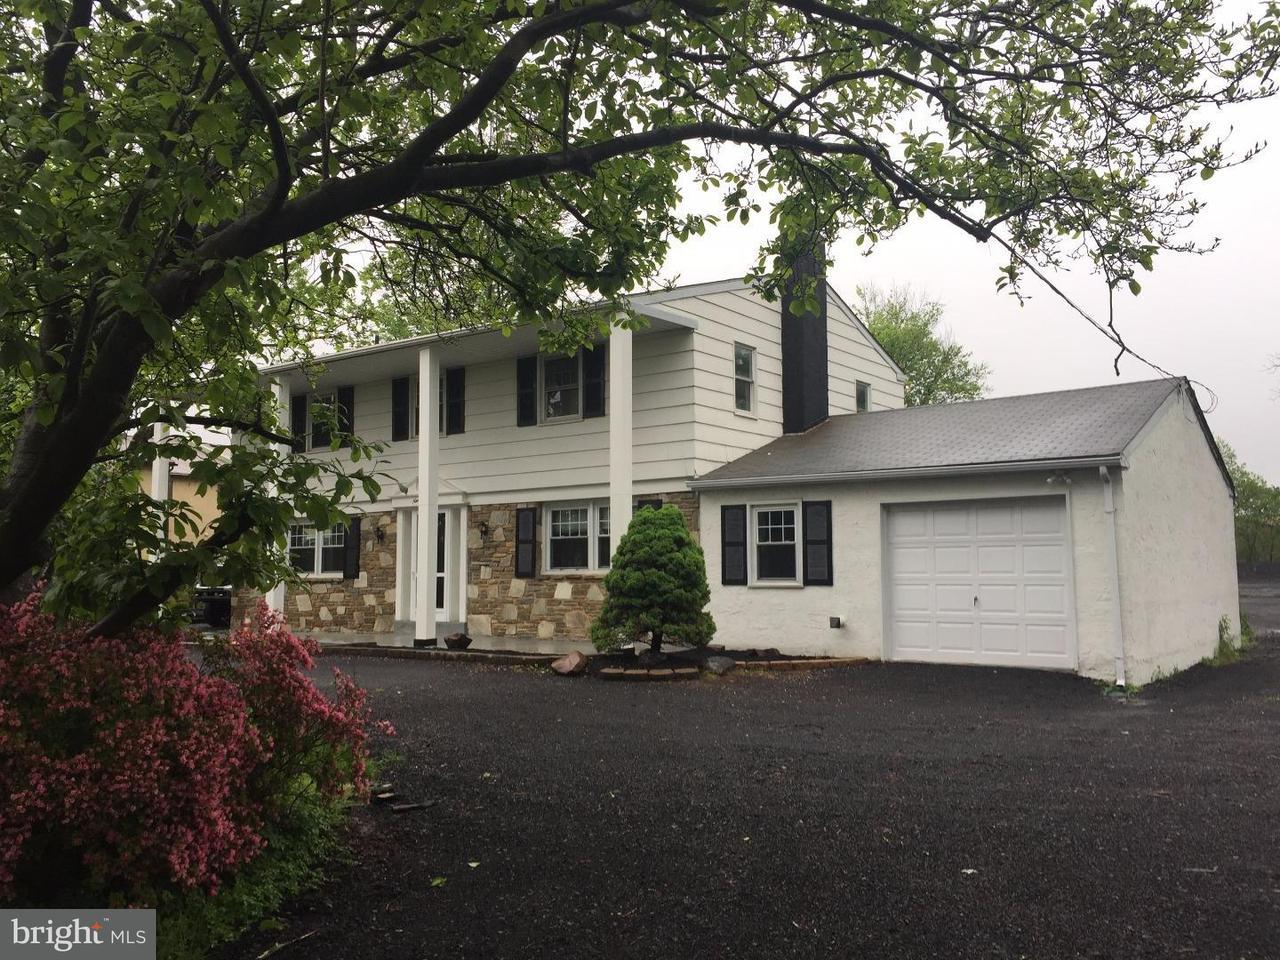 Single Family Home for Rent at 989 EASTON Road Warrington, Pennsylvania 18976 United States